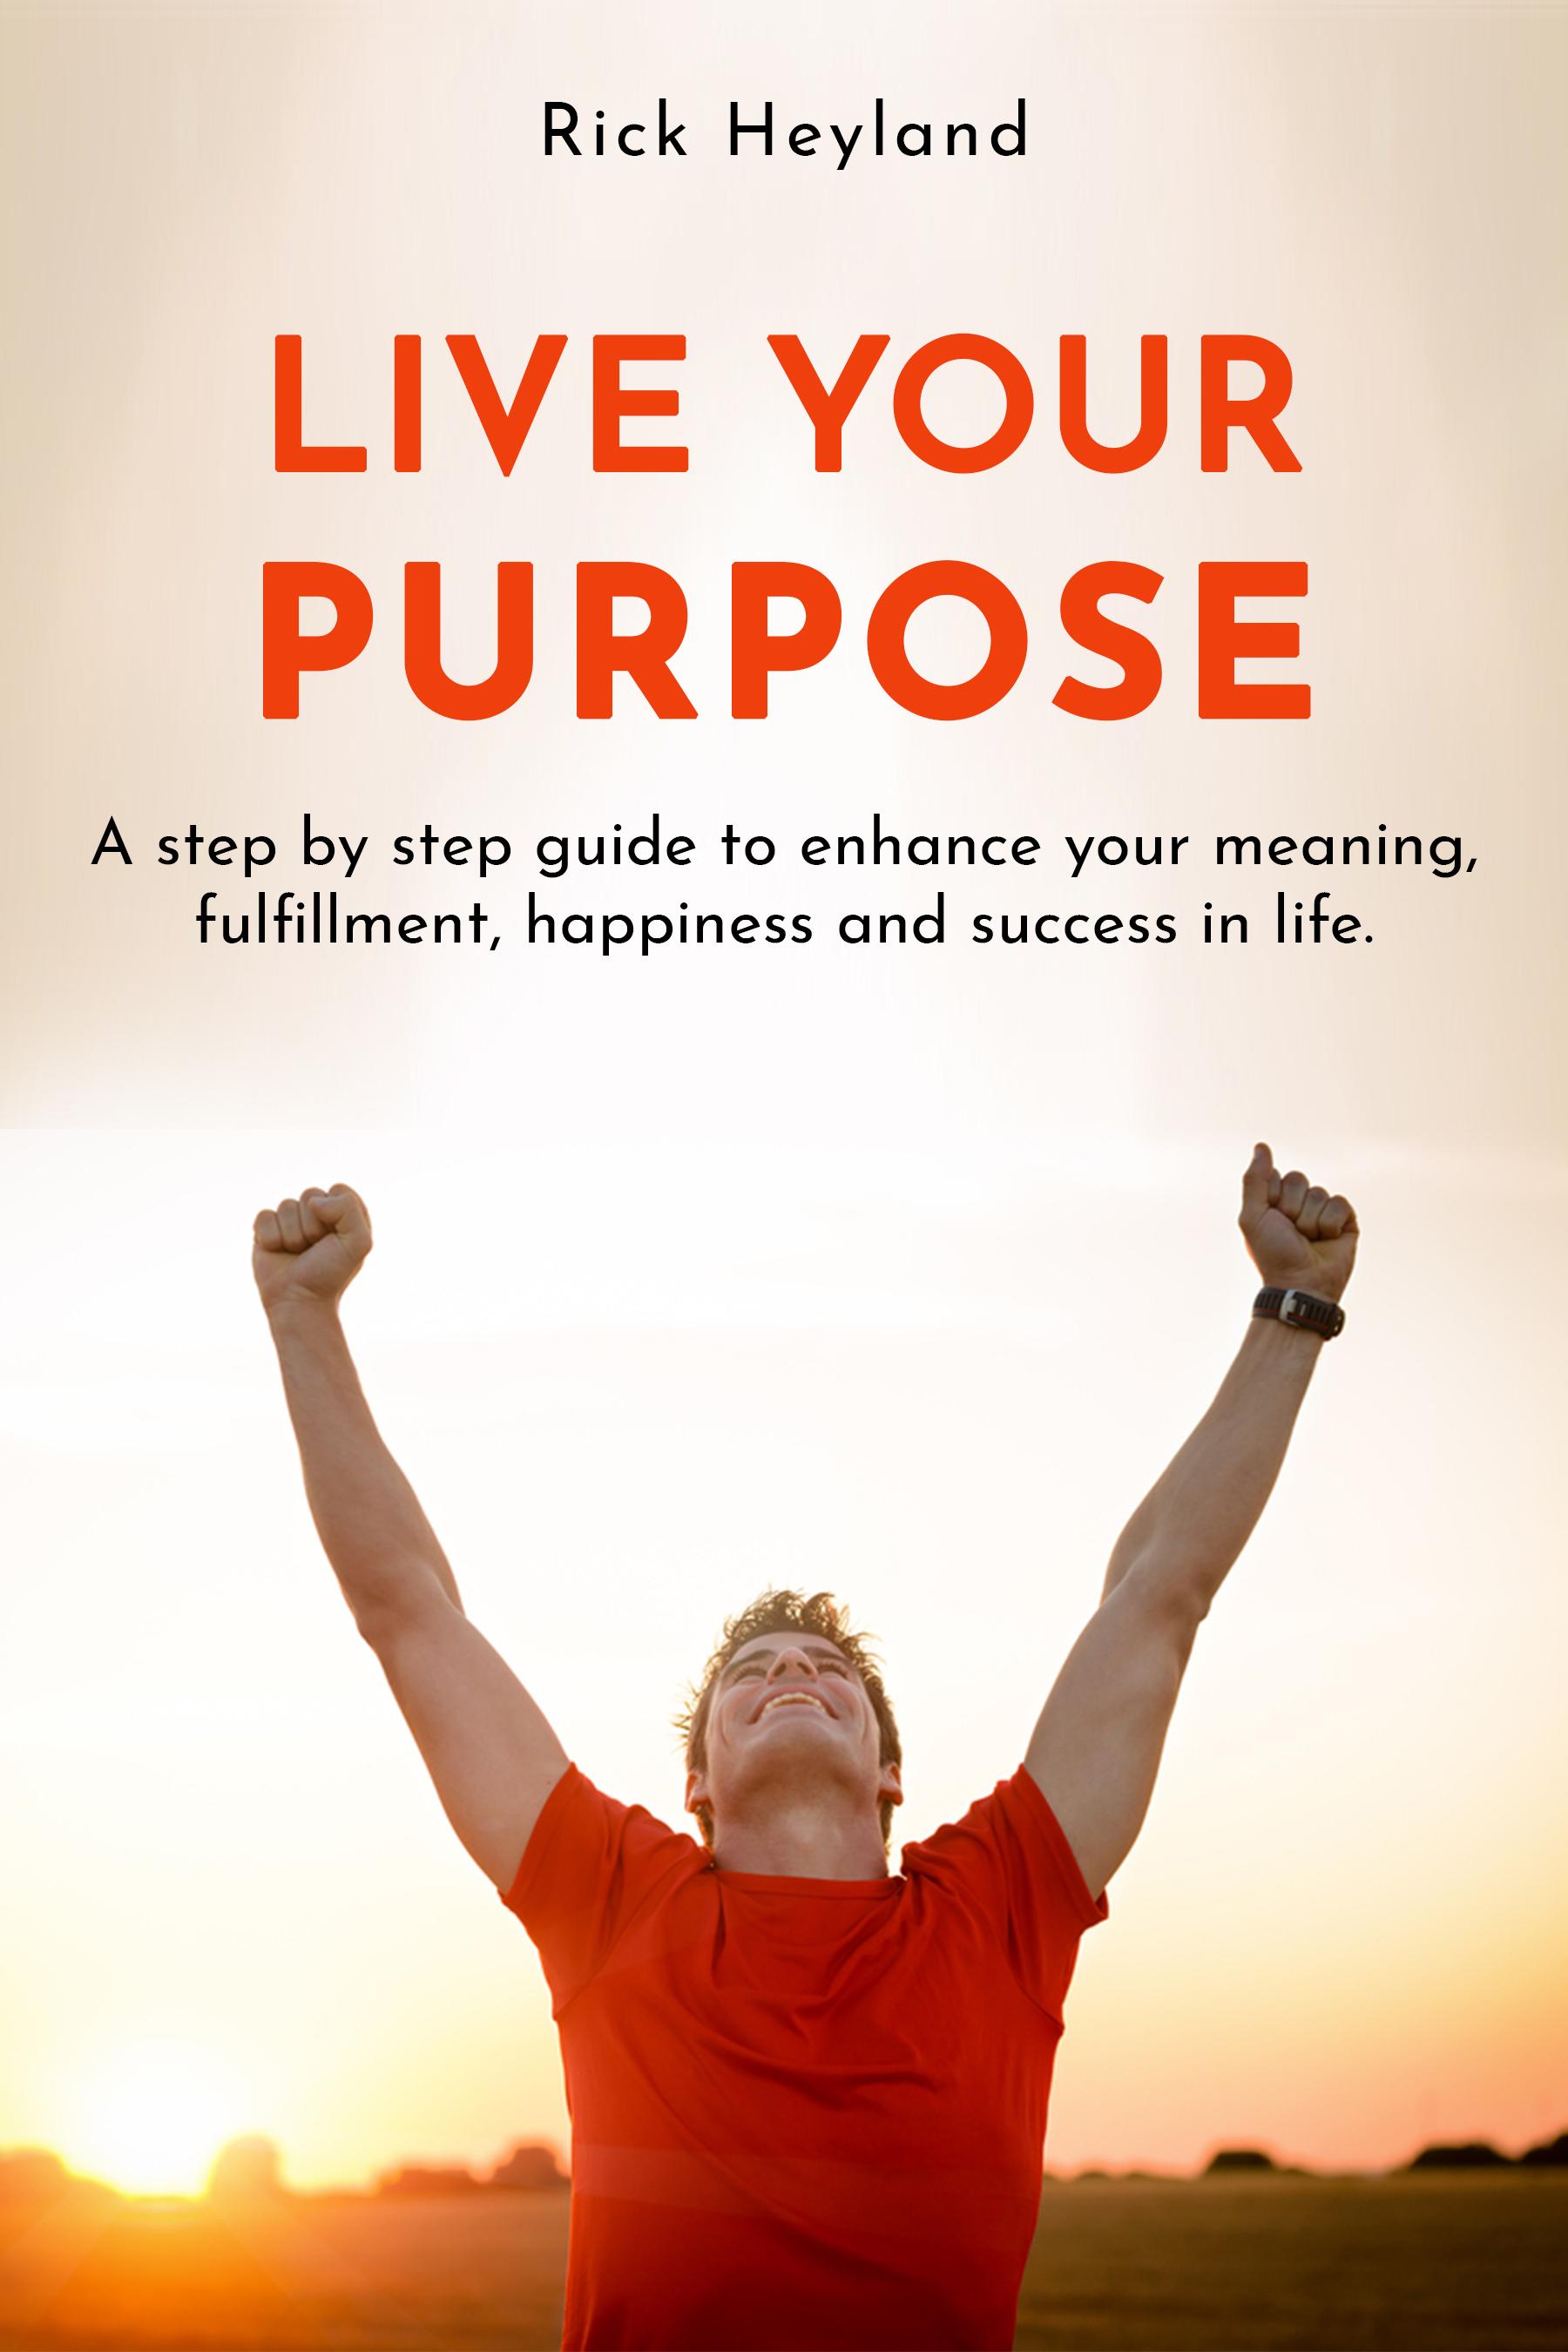 Live Your Purpose by Rick Heyland